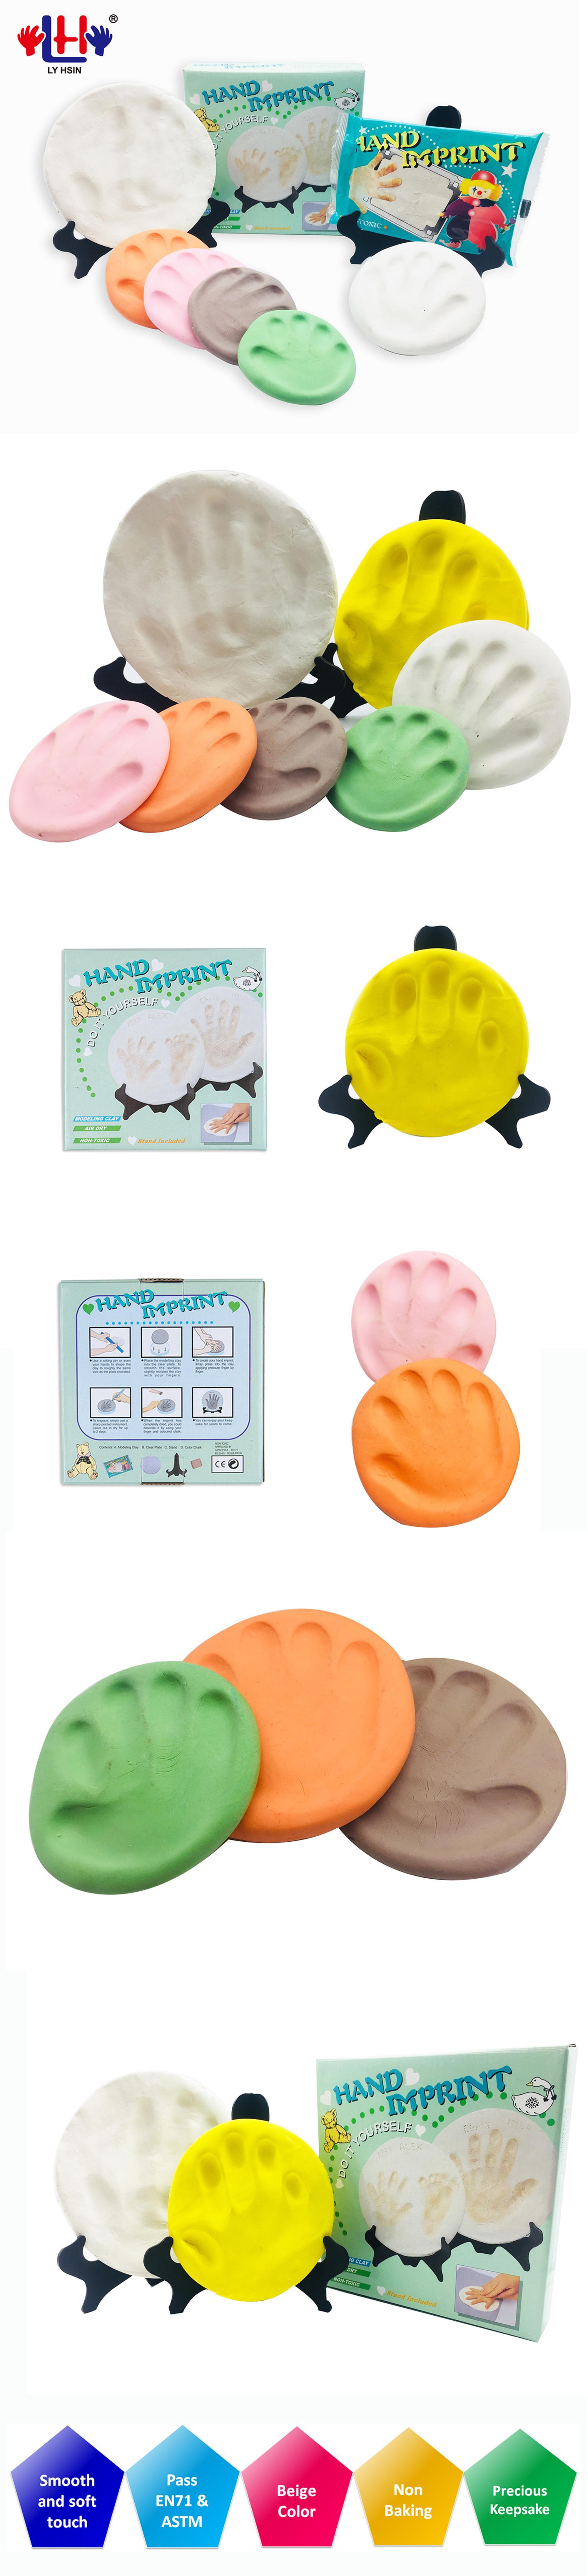 Handprint Clay6